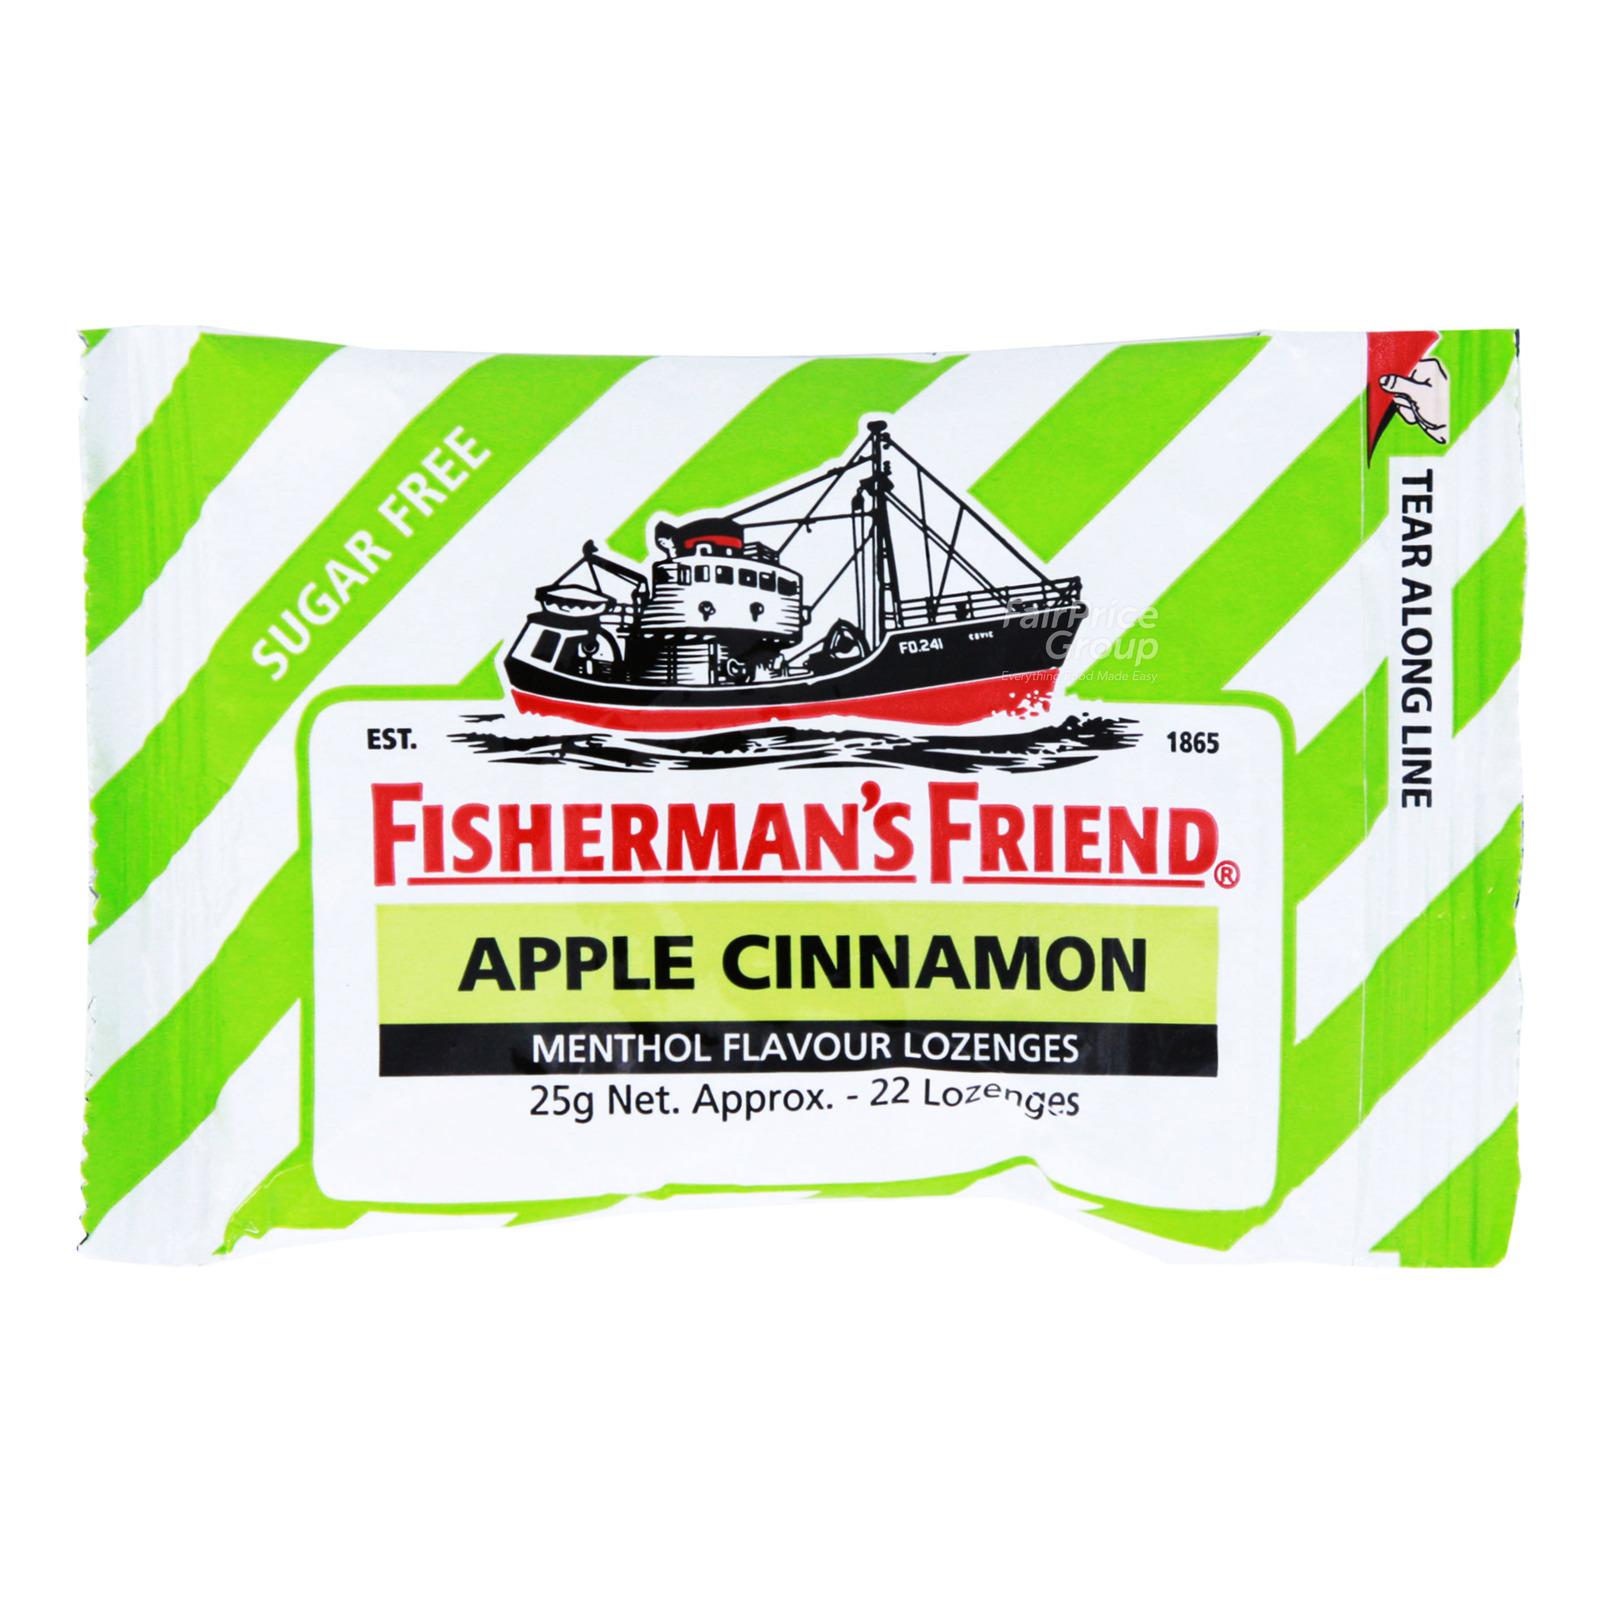 Fisherman's Friend Sugar Free Apple & Cinnamon Lozenges, 25g